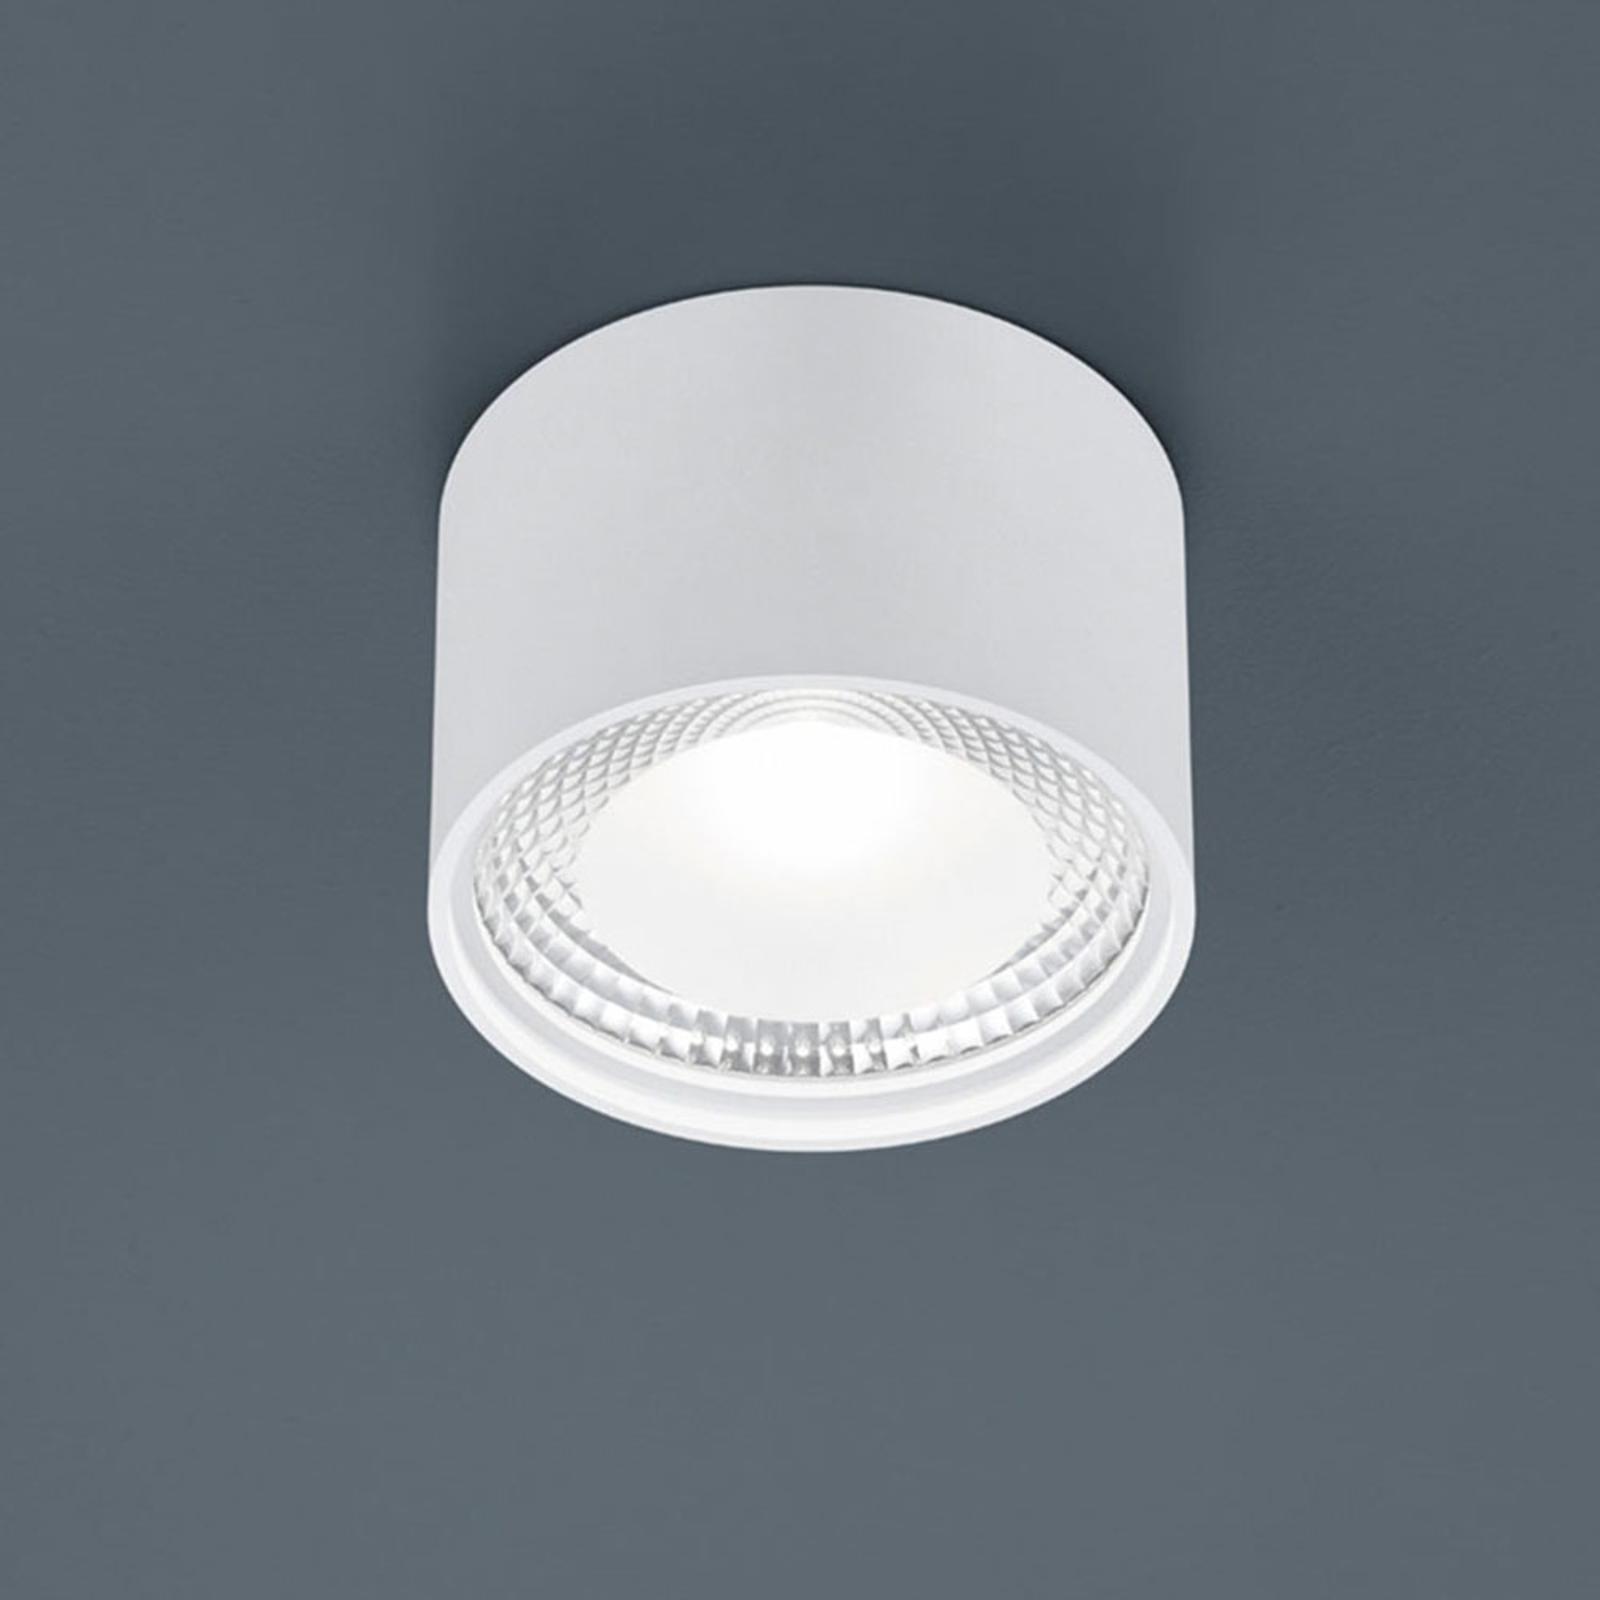 Helestra Kari LED plafondlamp, rond, wit